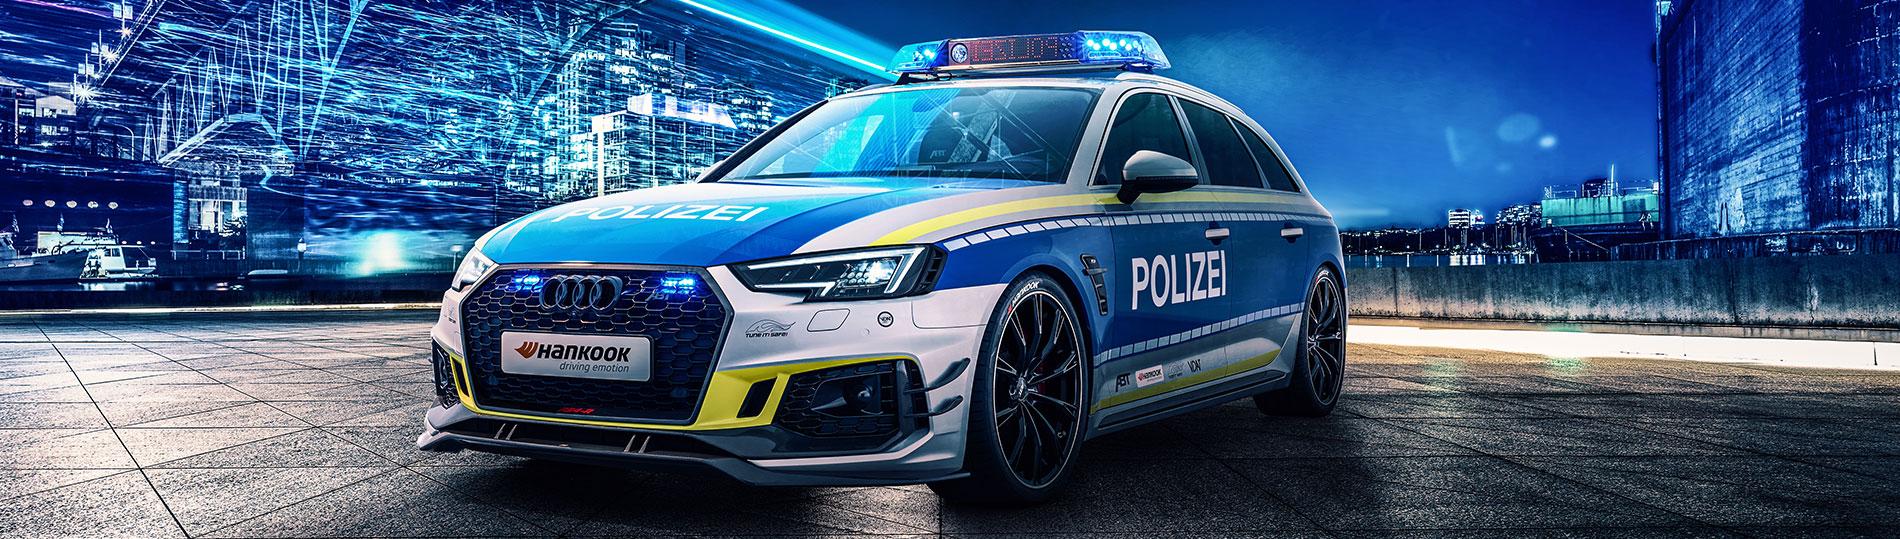 Tune It Safe ABT Audi mit Polizei Optik Tuning